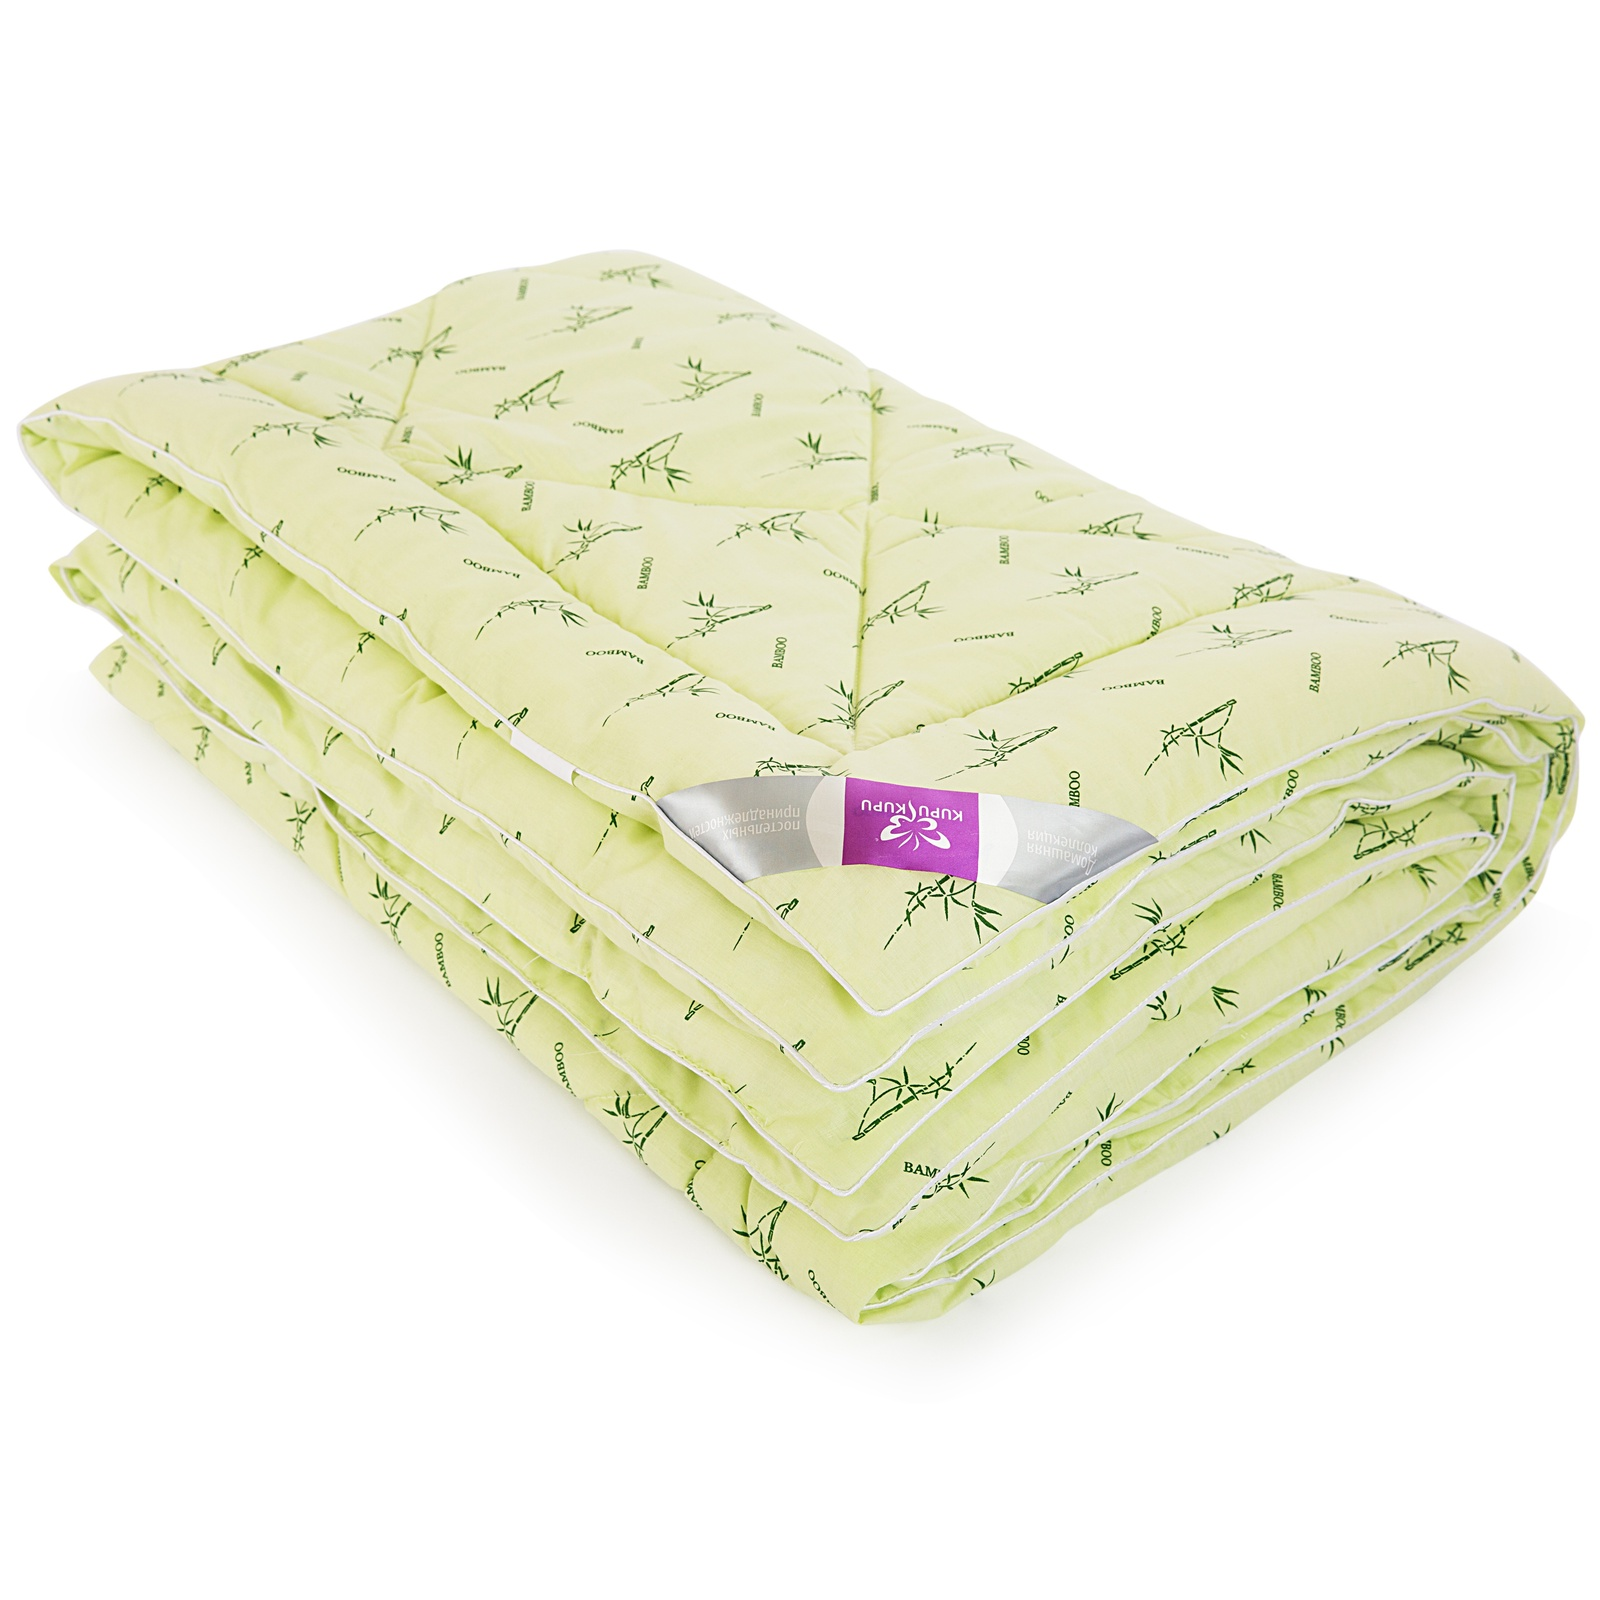 Одеяло KUPU-KUPU Бамбук салатовый 200х205 см